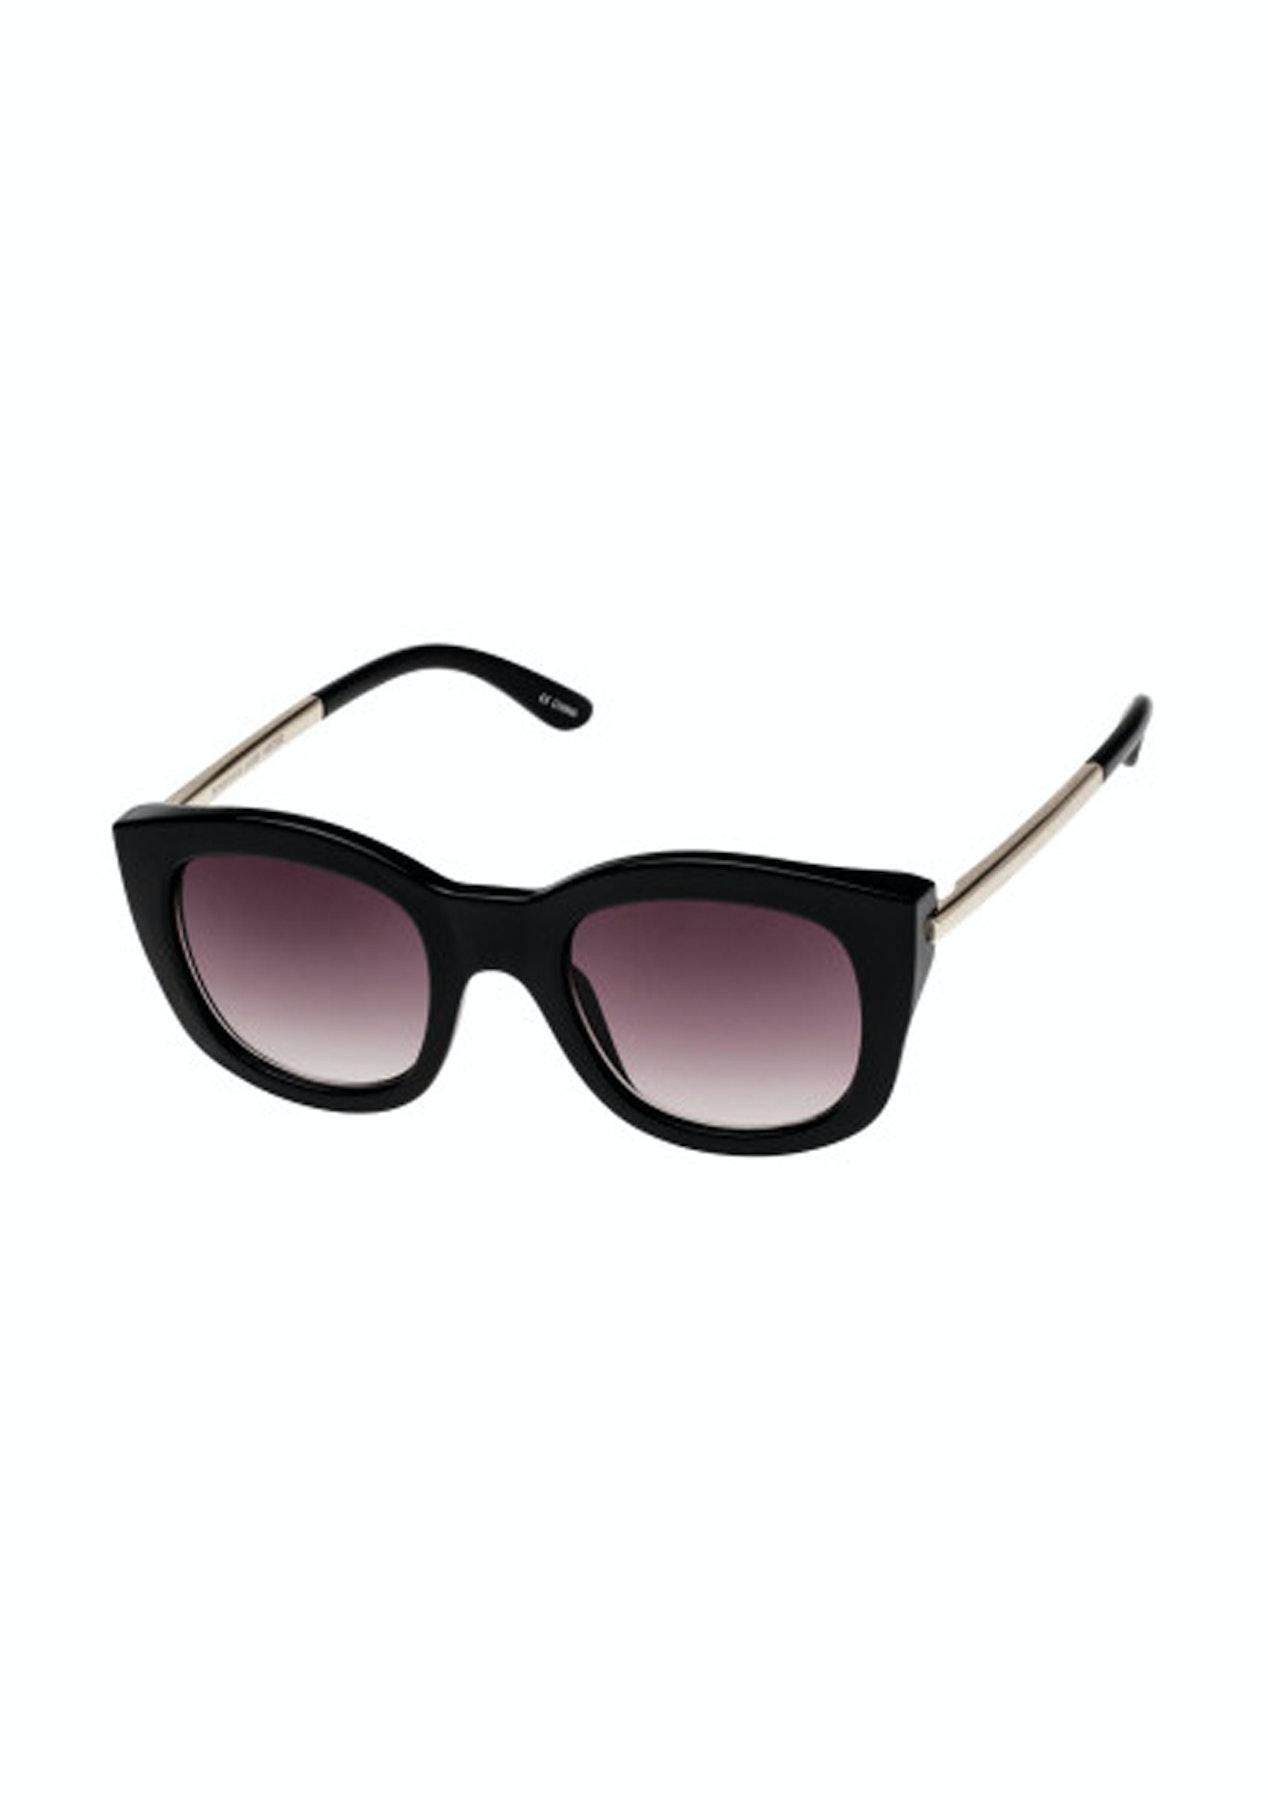 93f192ef0a5 Le Specs - Runaways Luxe 1402002 - Under  25 Eyewear - Onceit